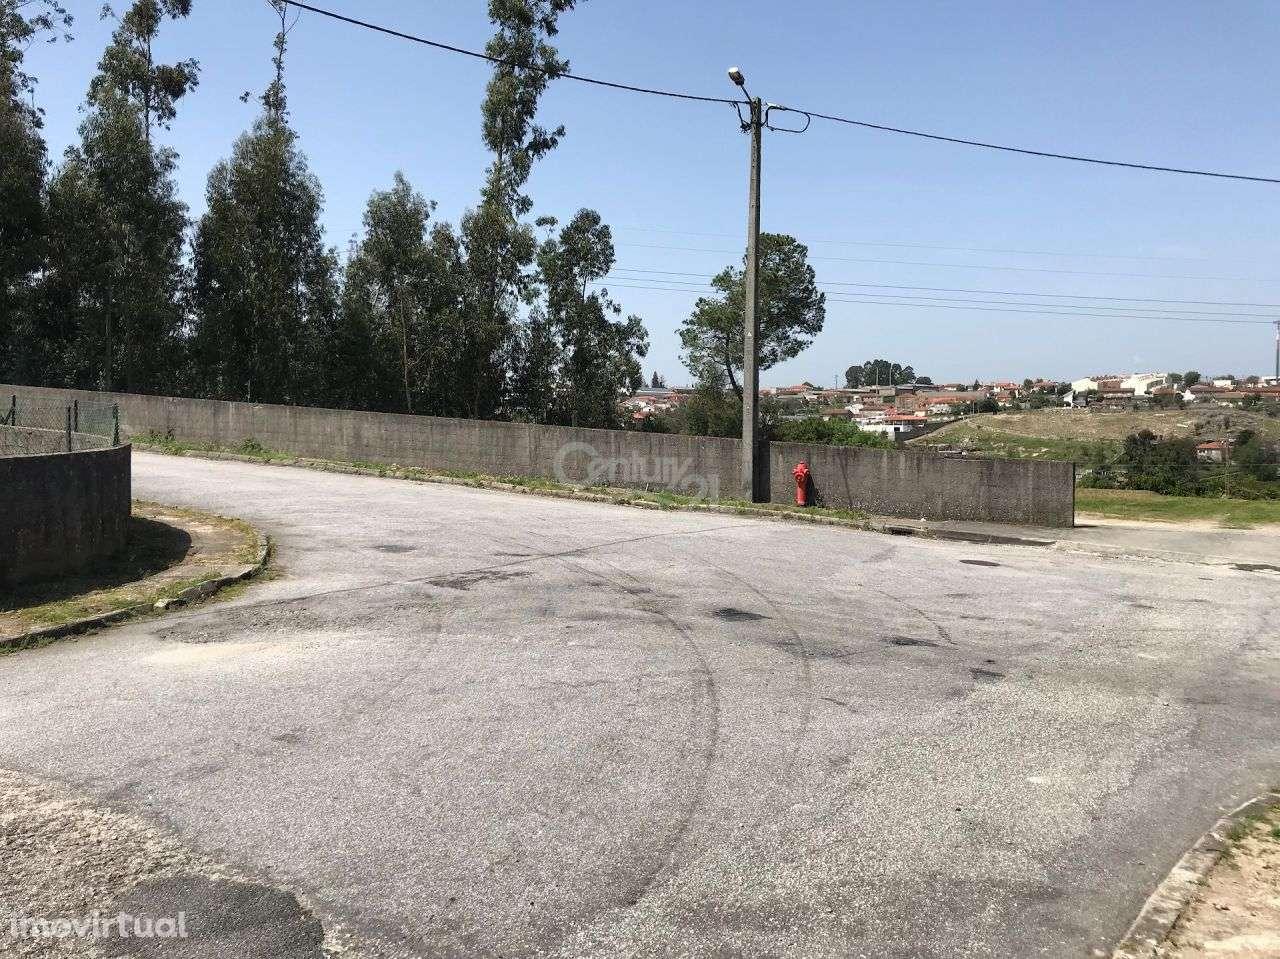 Terreno para comprar, Castêlo da Maia, Porto - Foto 2